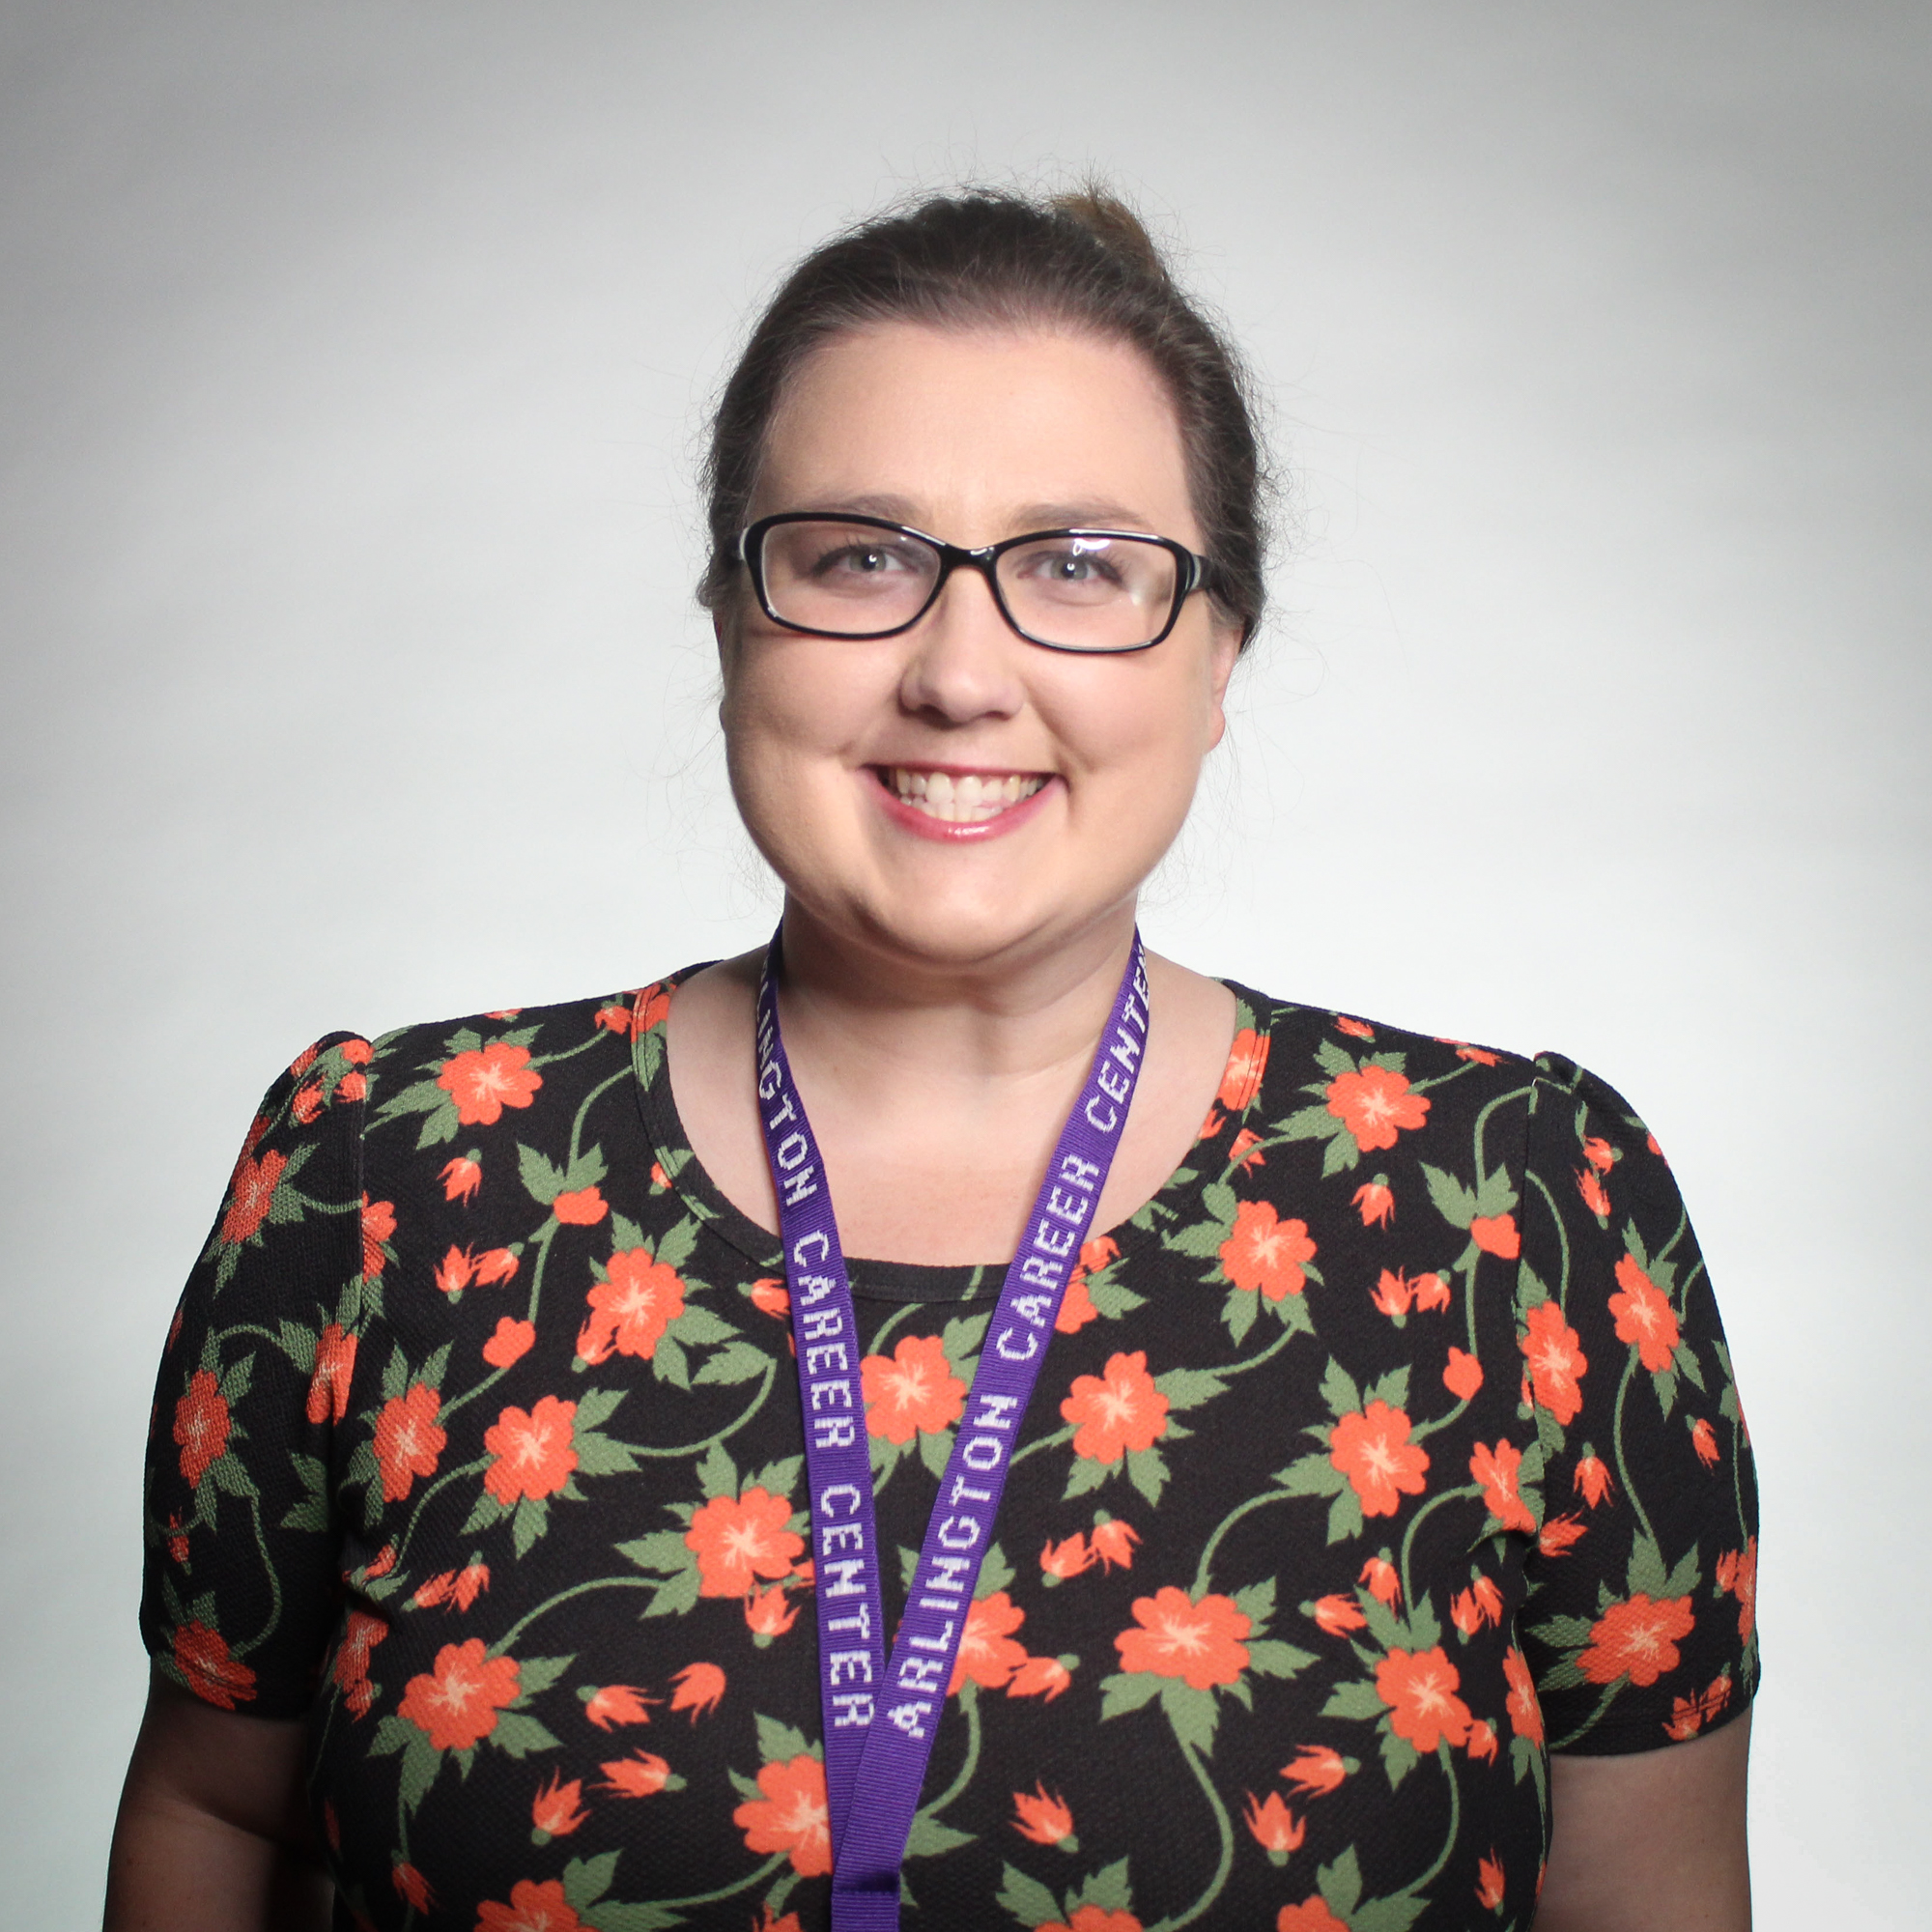 Ms. Kelly Antal